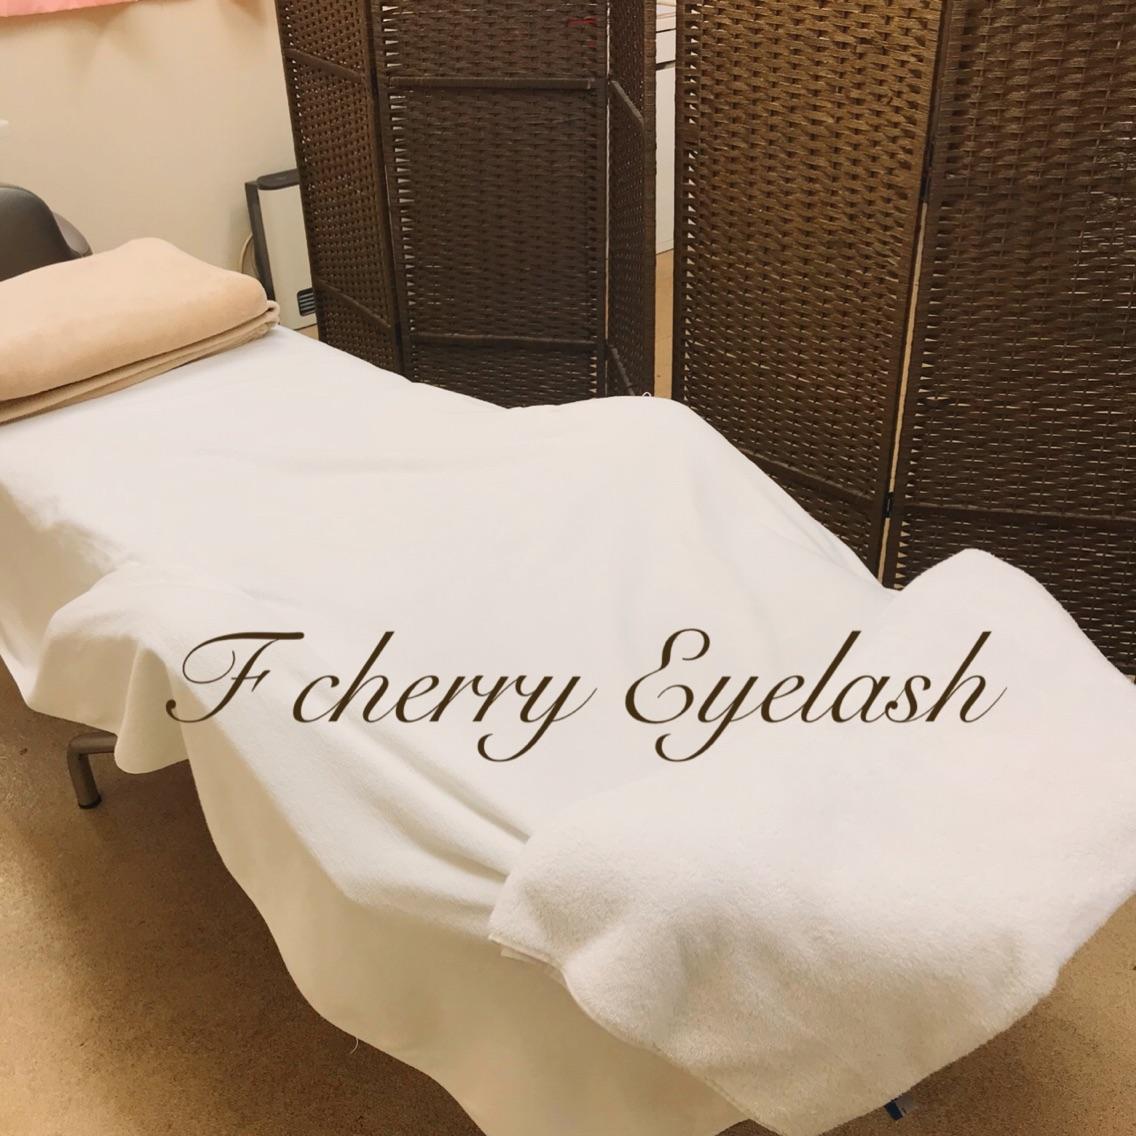 f cherry(エフチェリー)